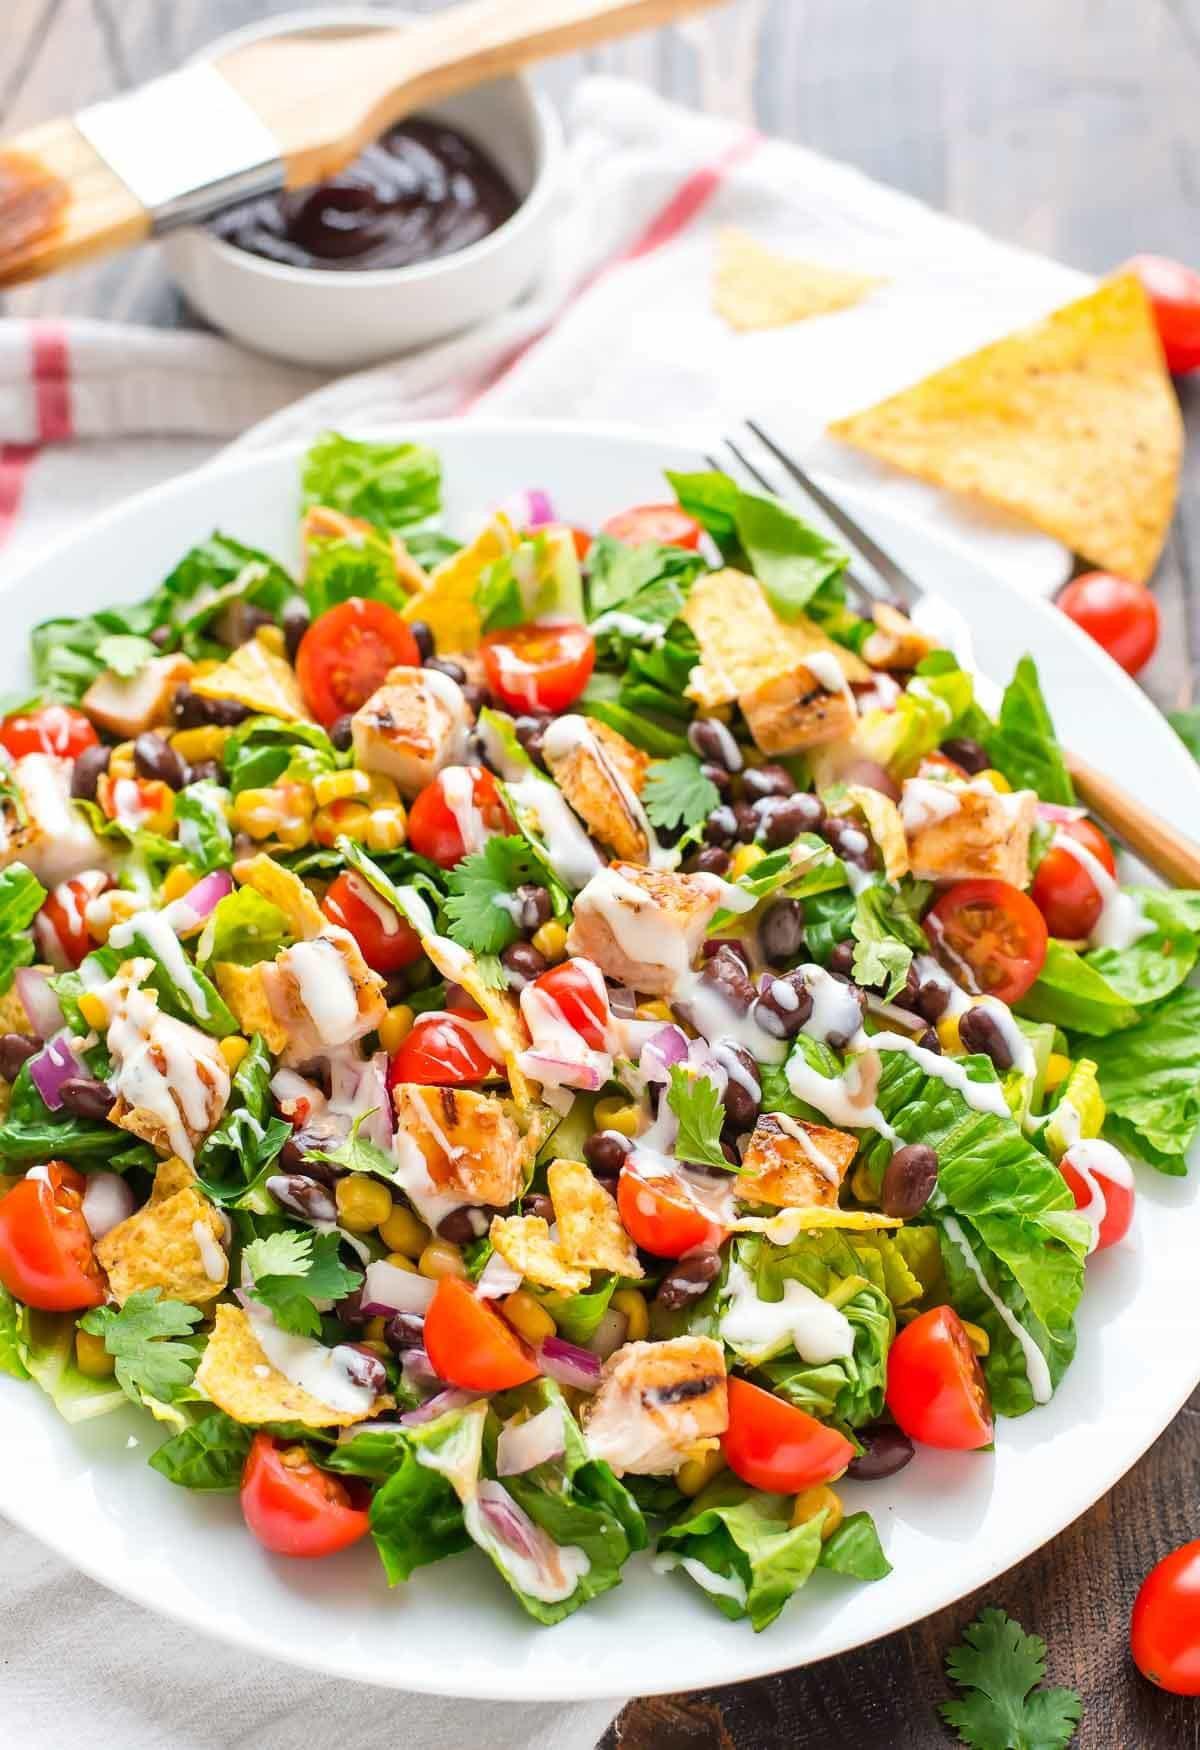 Healthy Chicken Salad Recipes 20 Best Ideas Bbq Chicken Salad with Creamy Ranch